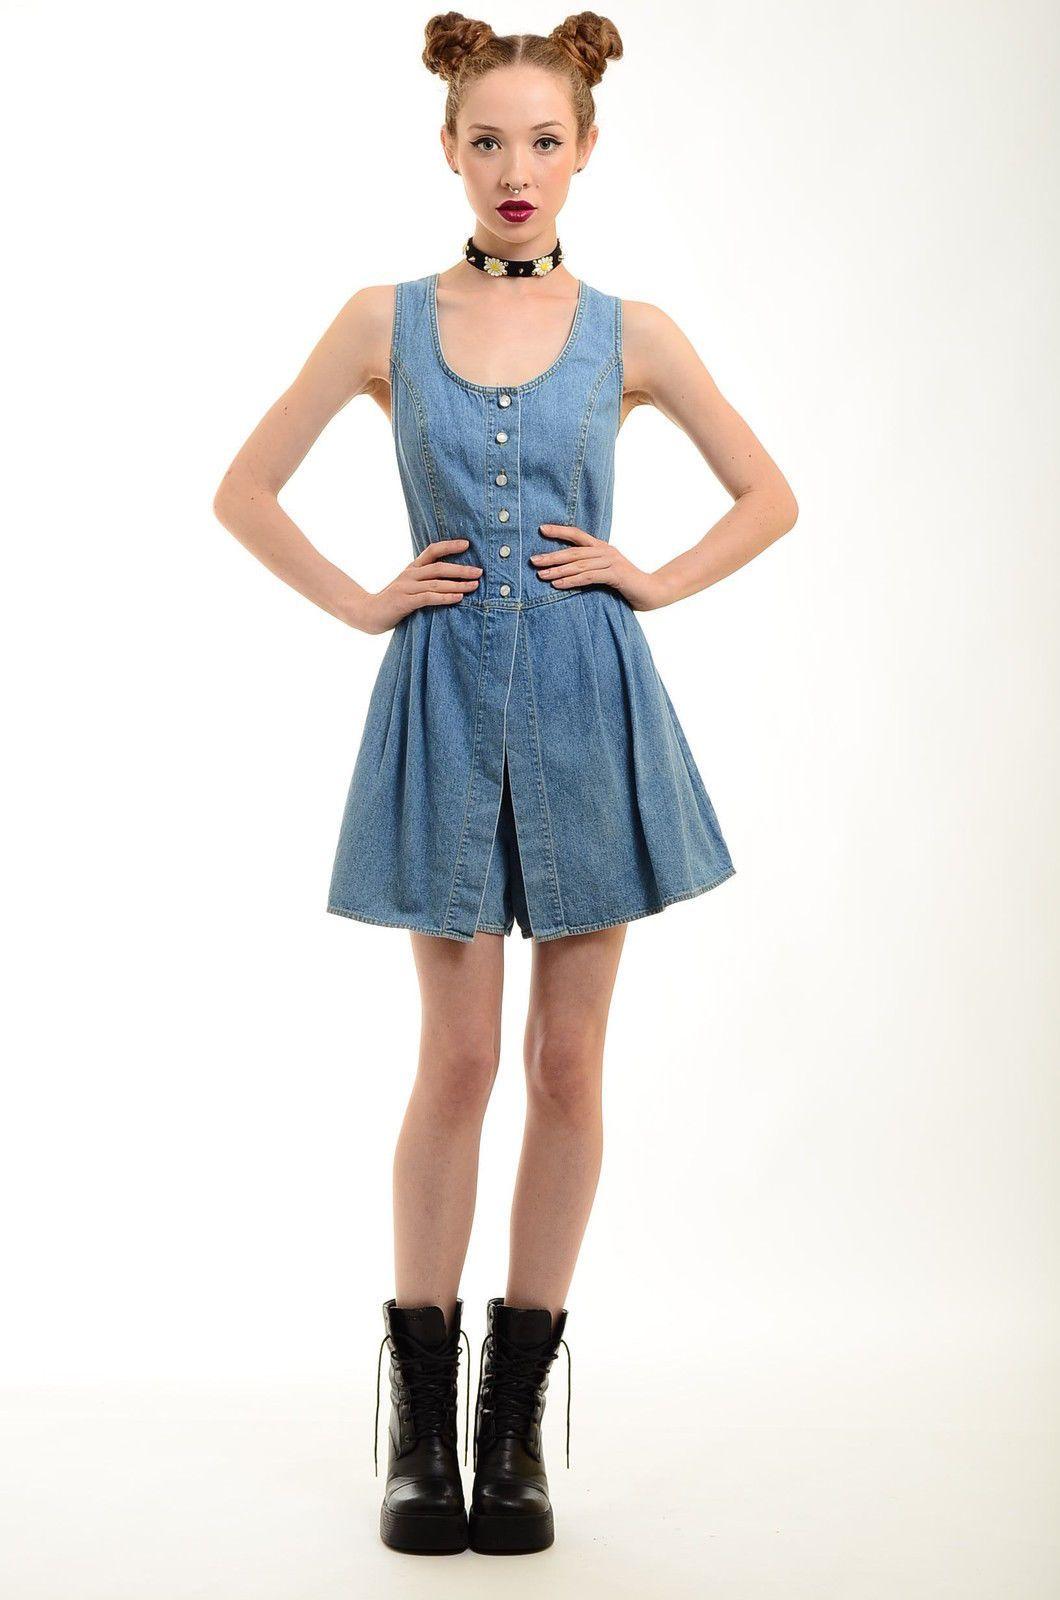 Vtg 80s 90s Faded DENIM Grunge Jean Shorts ROMPER Mini Dress Overalls Jumper M | Overalls ...